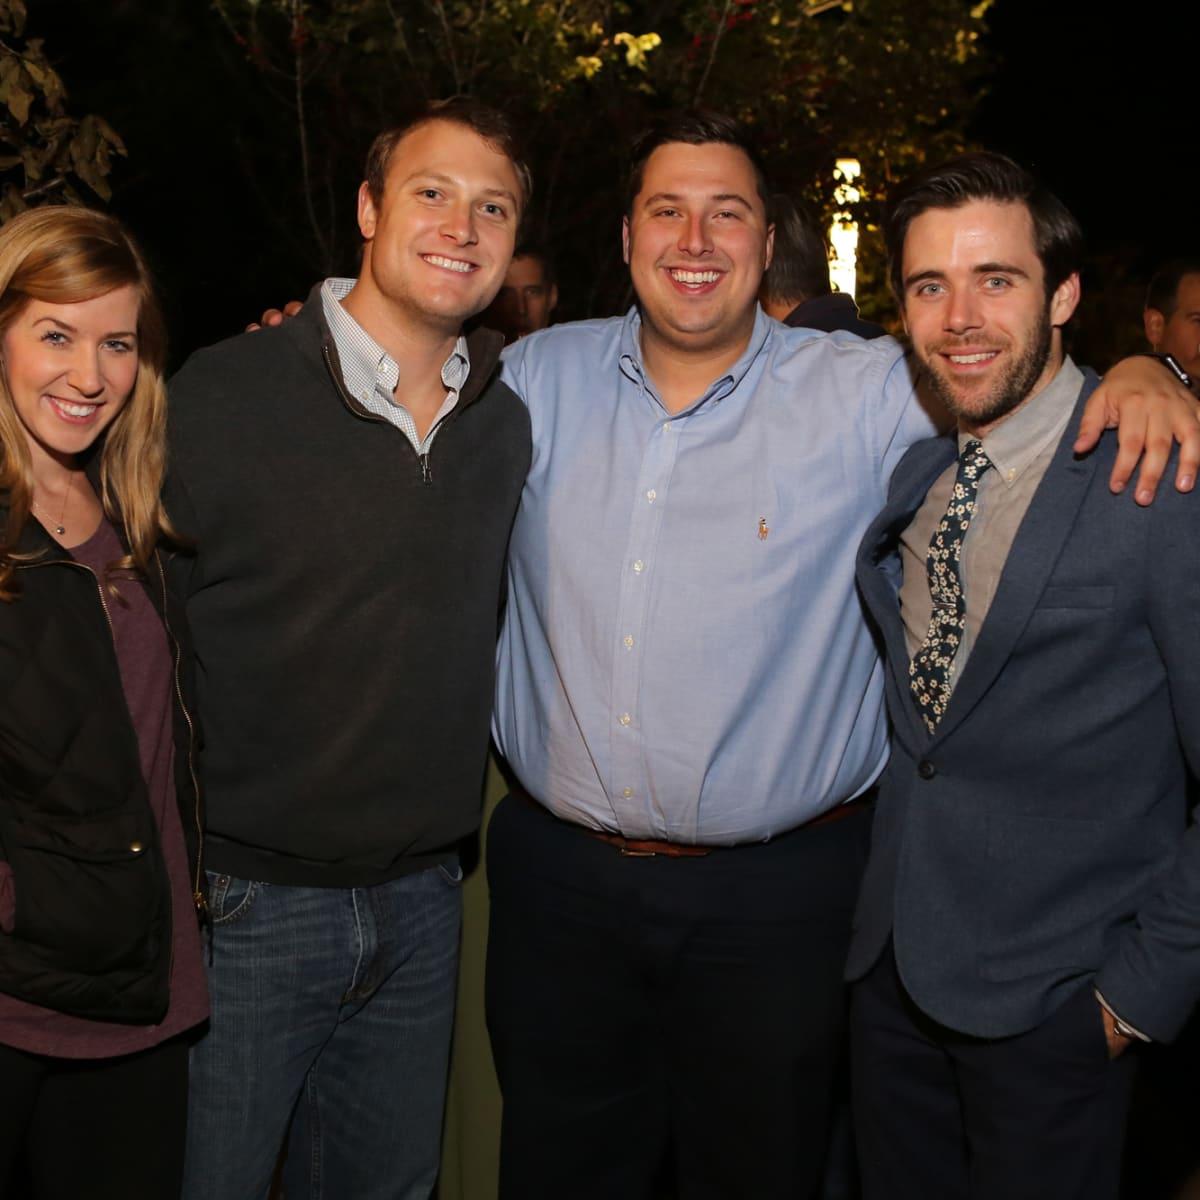 News, Shelby, Urban Wild Bridge Bash, Nov. 2015, Claire Peterson, Michael Gerrish, Mark Salvie, Connor Walsh